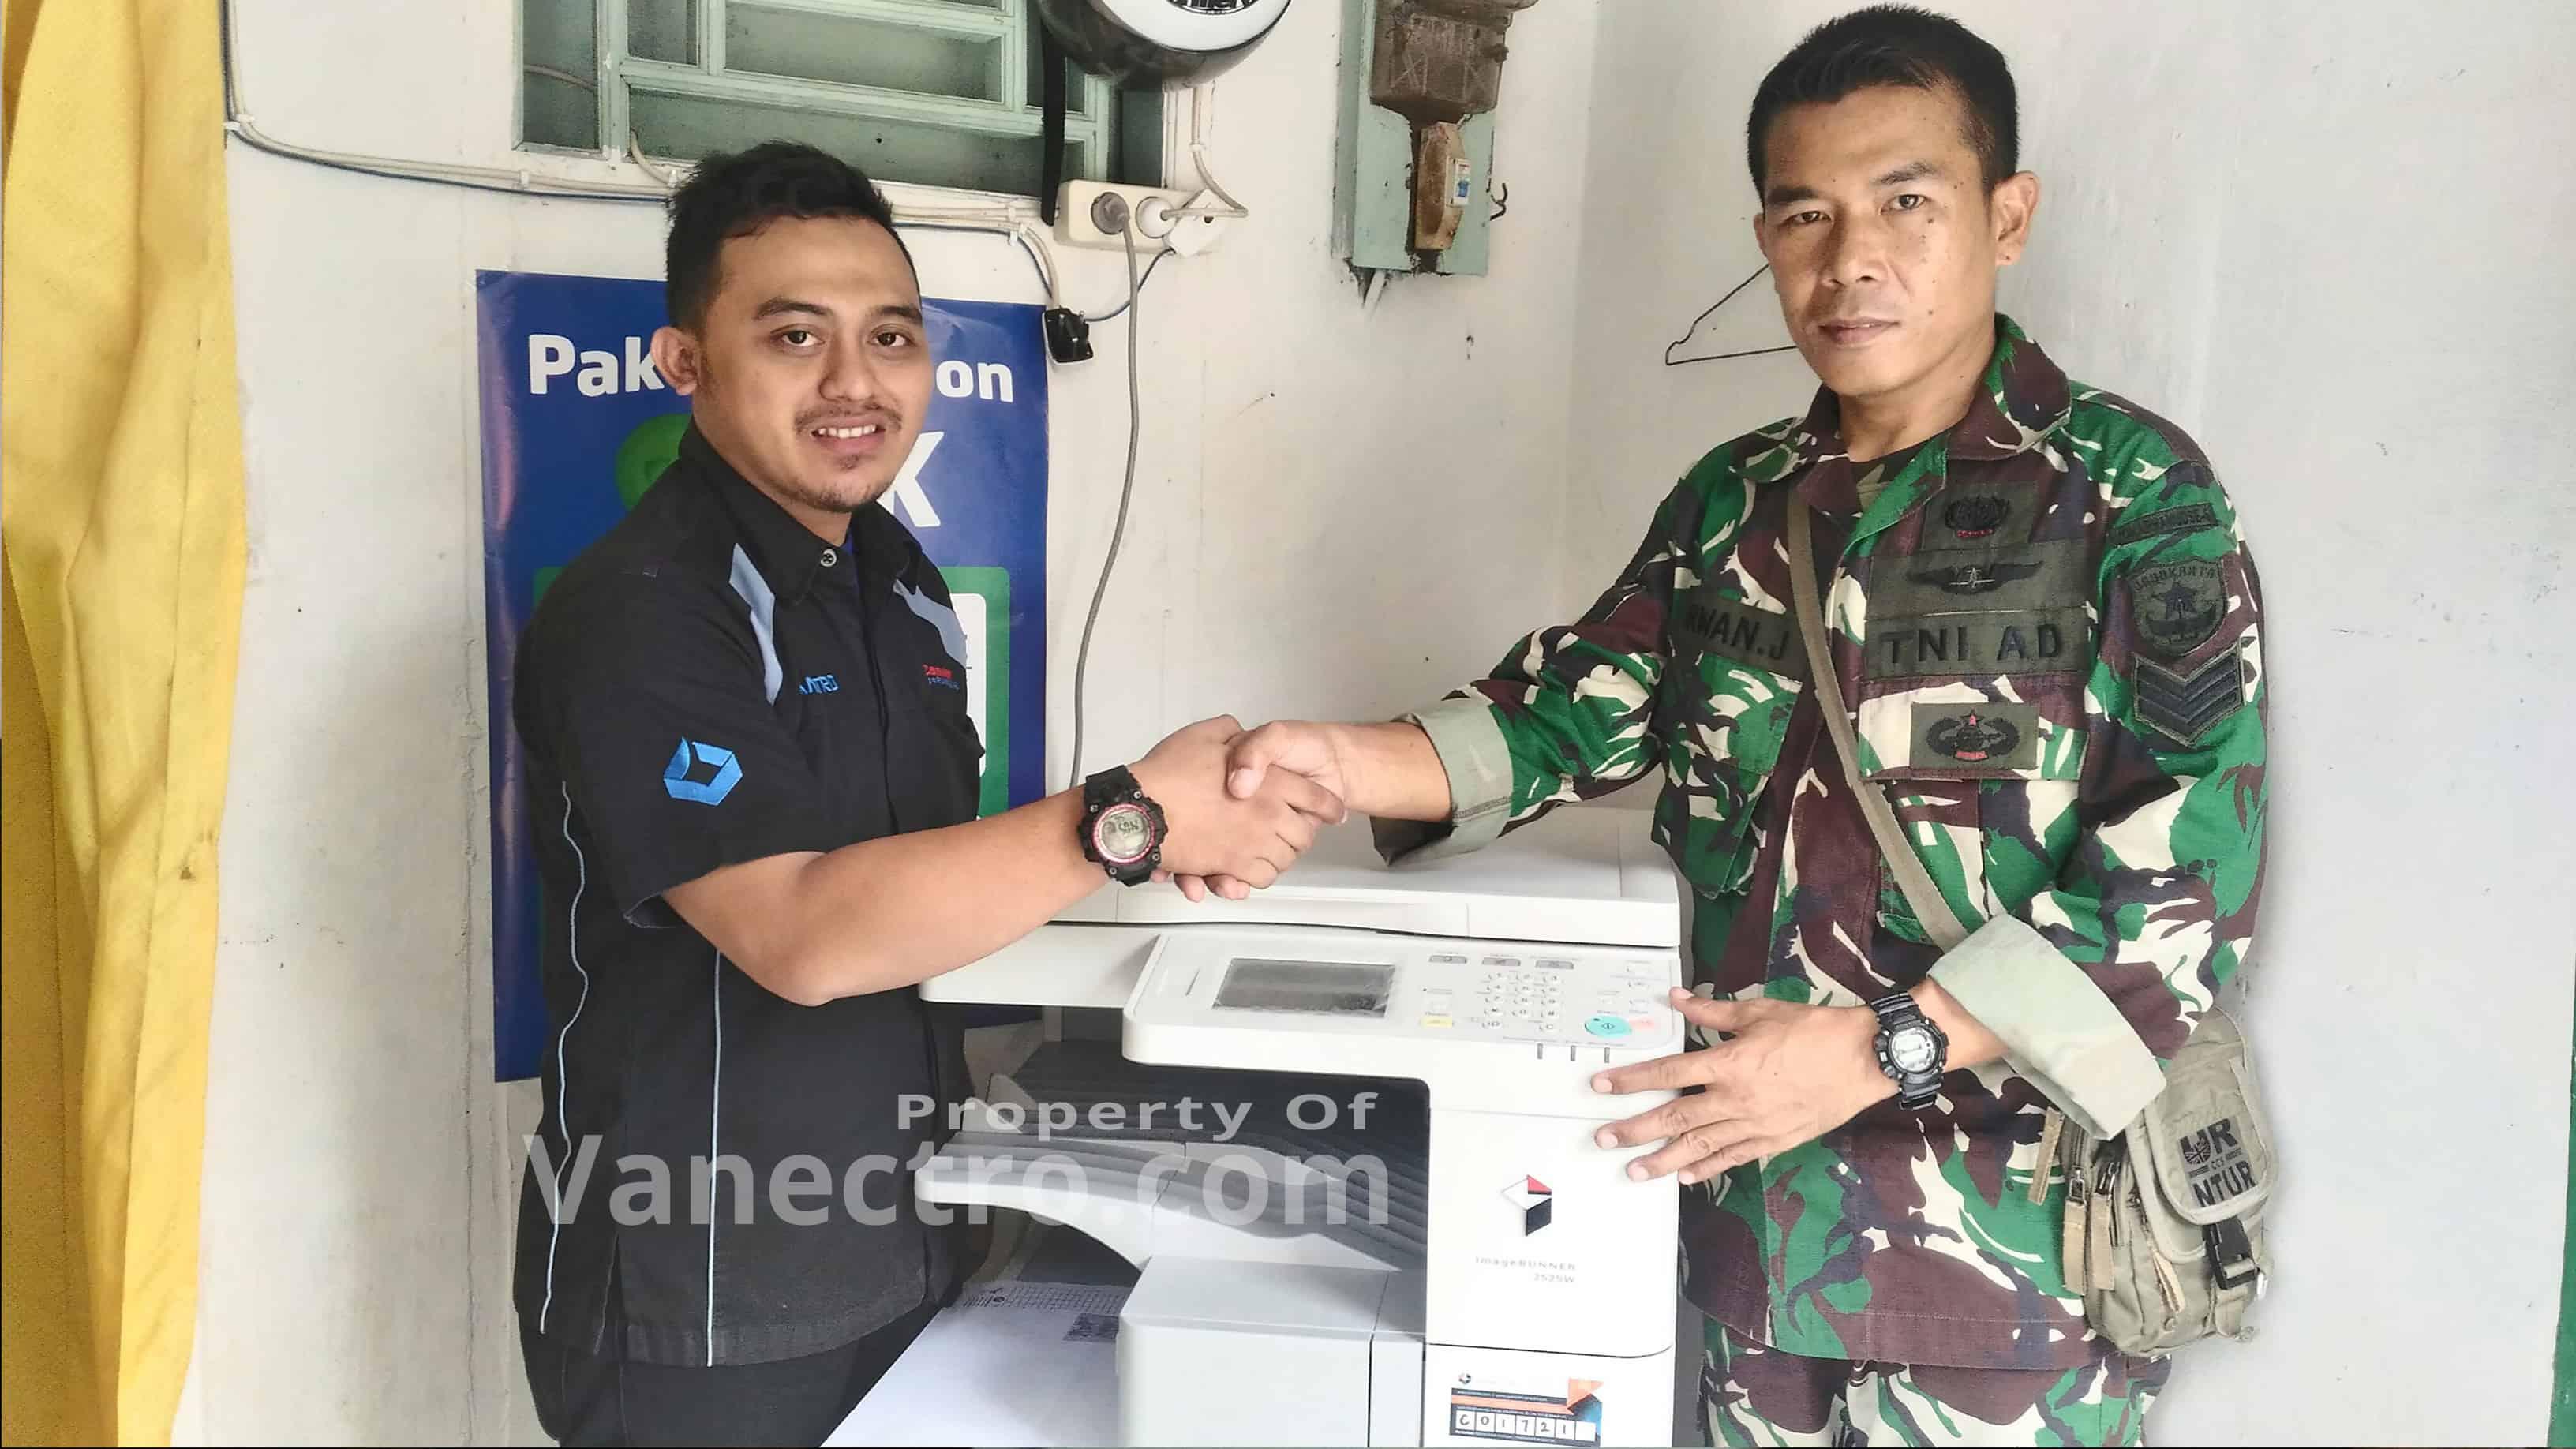 Pengiriman Penjualan Mesin Fotocopy Mesin Fotocopy Canon Ir 2525 + Platten Milik Bp. Erwan